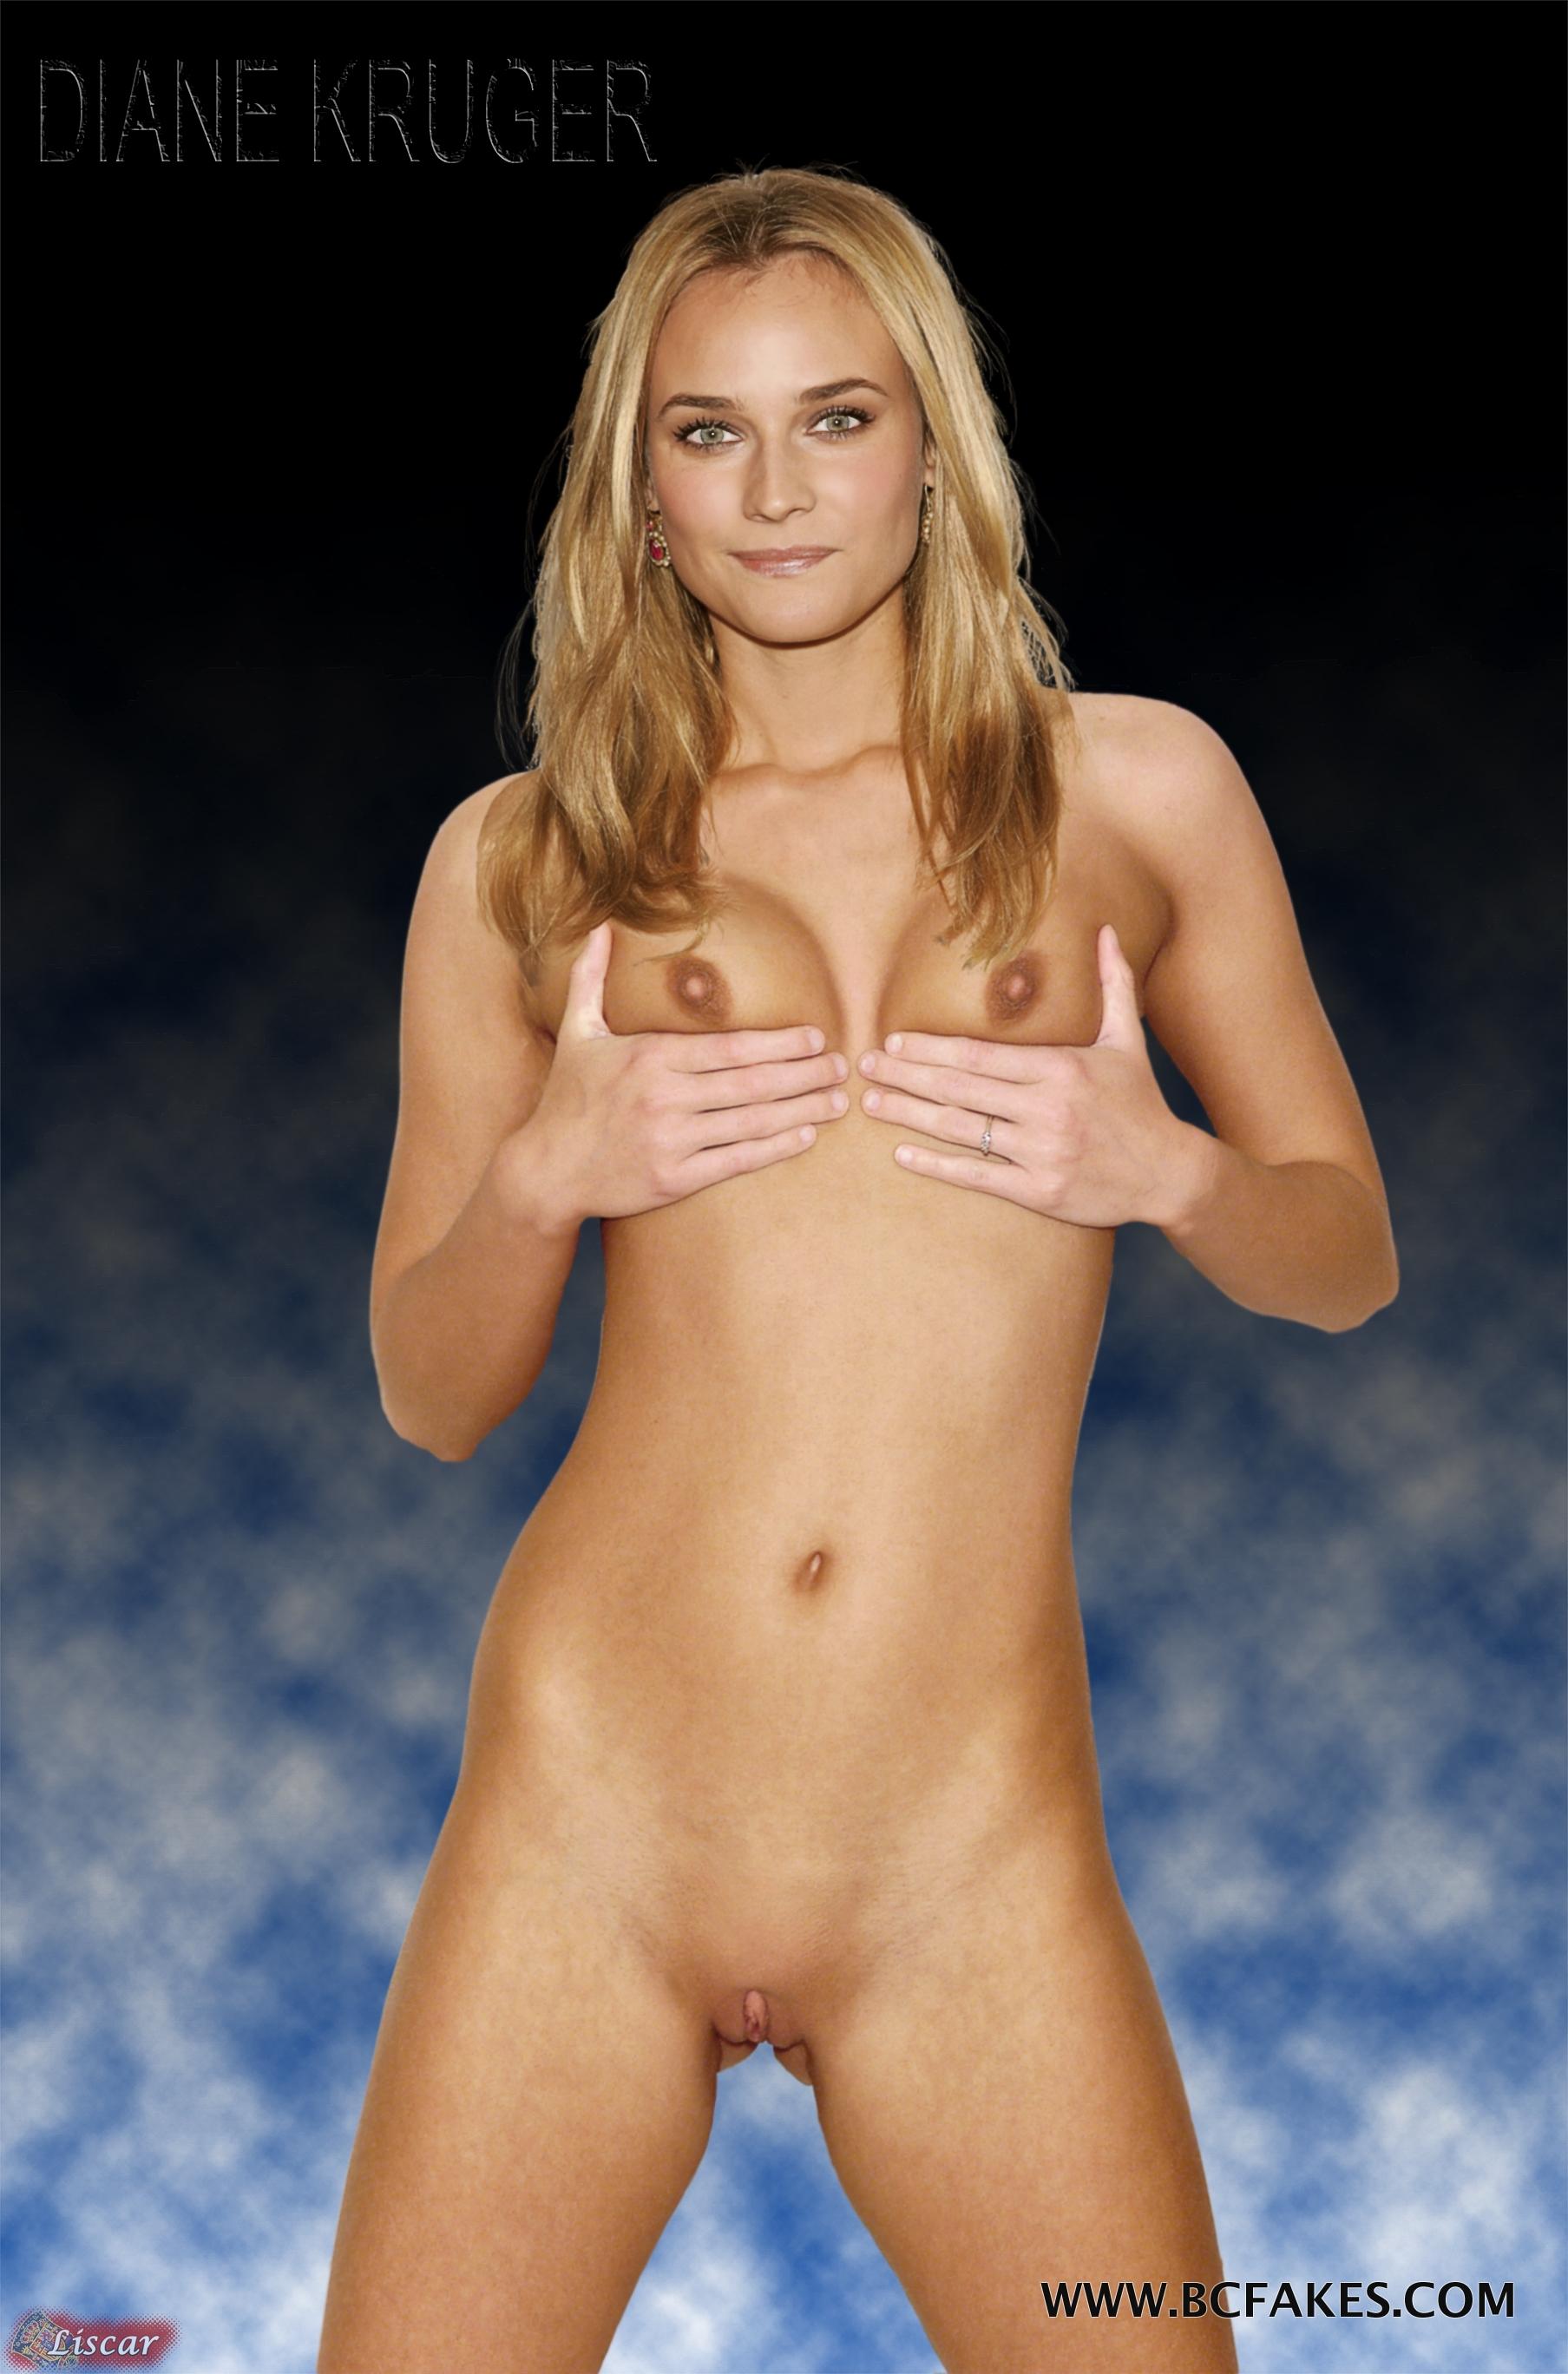 naked-naked-tits-diane-kruger-schoocheerleader-pussy-slips